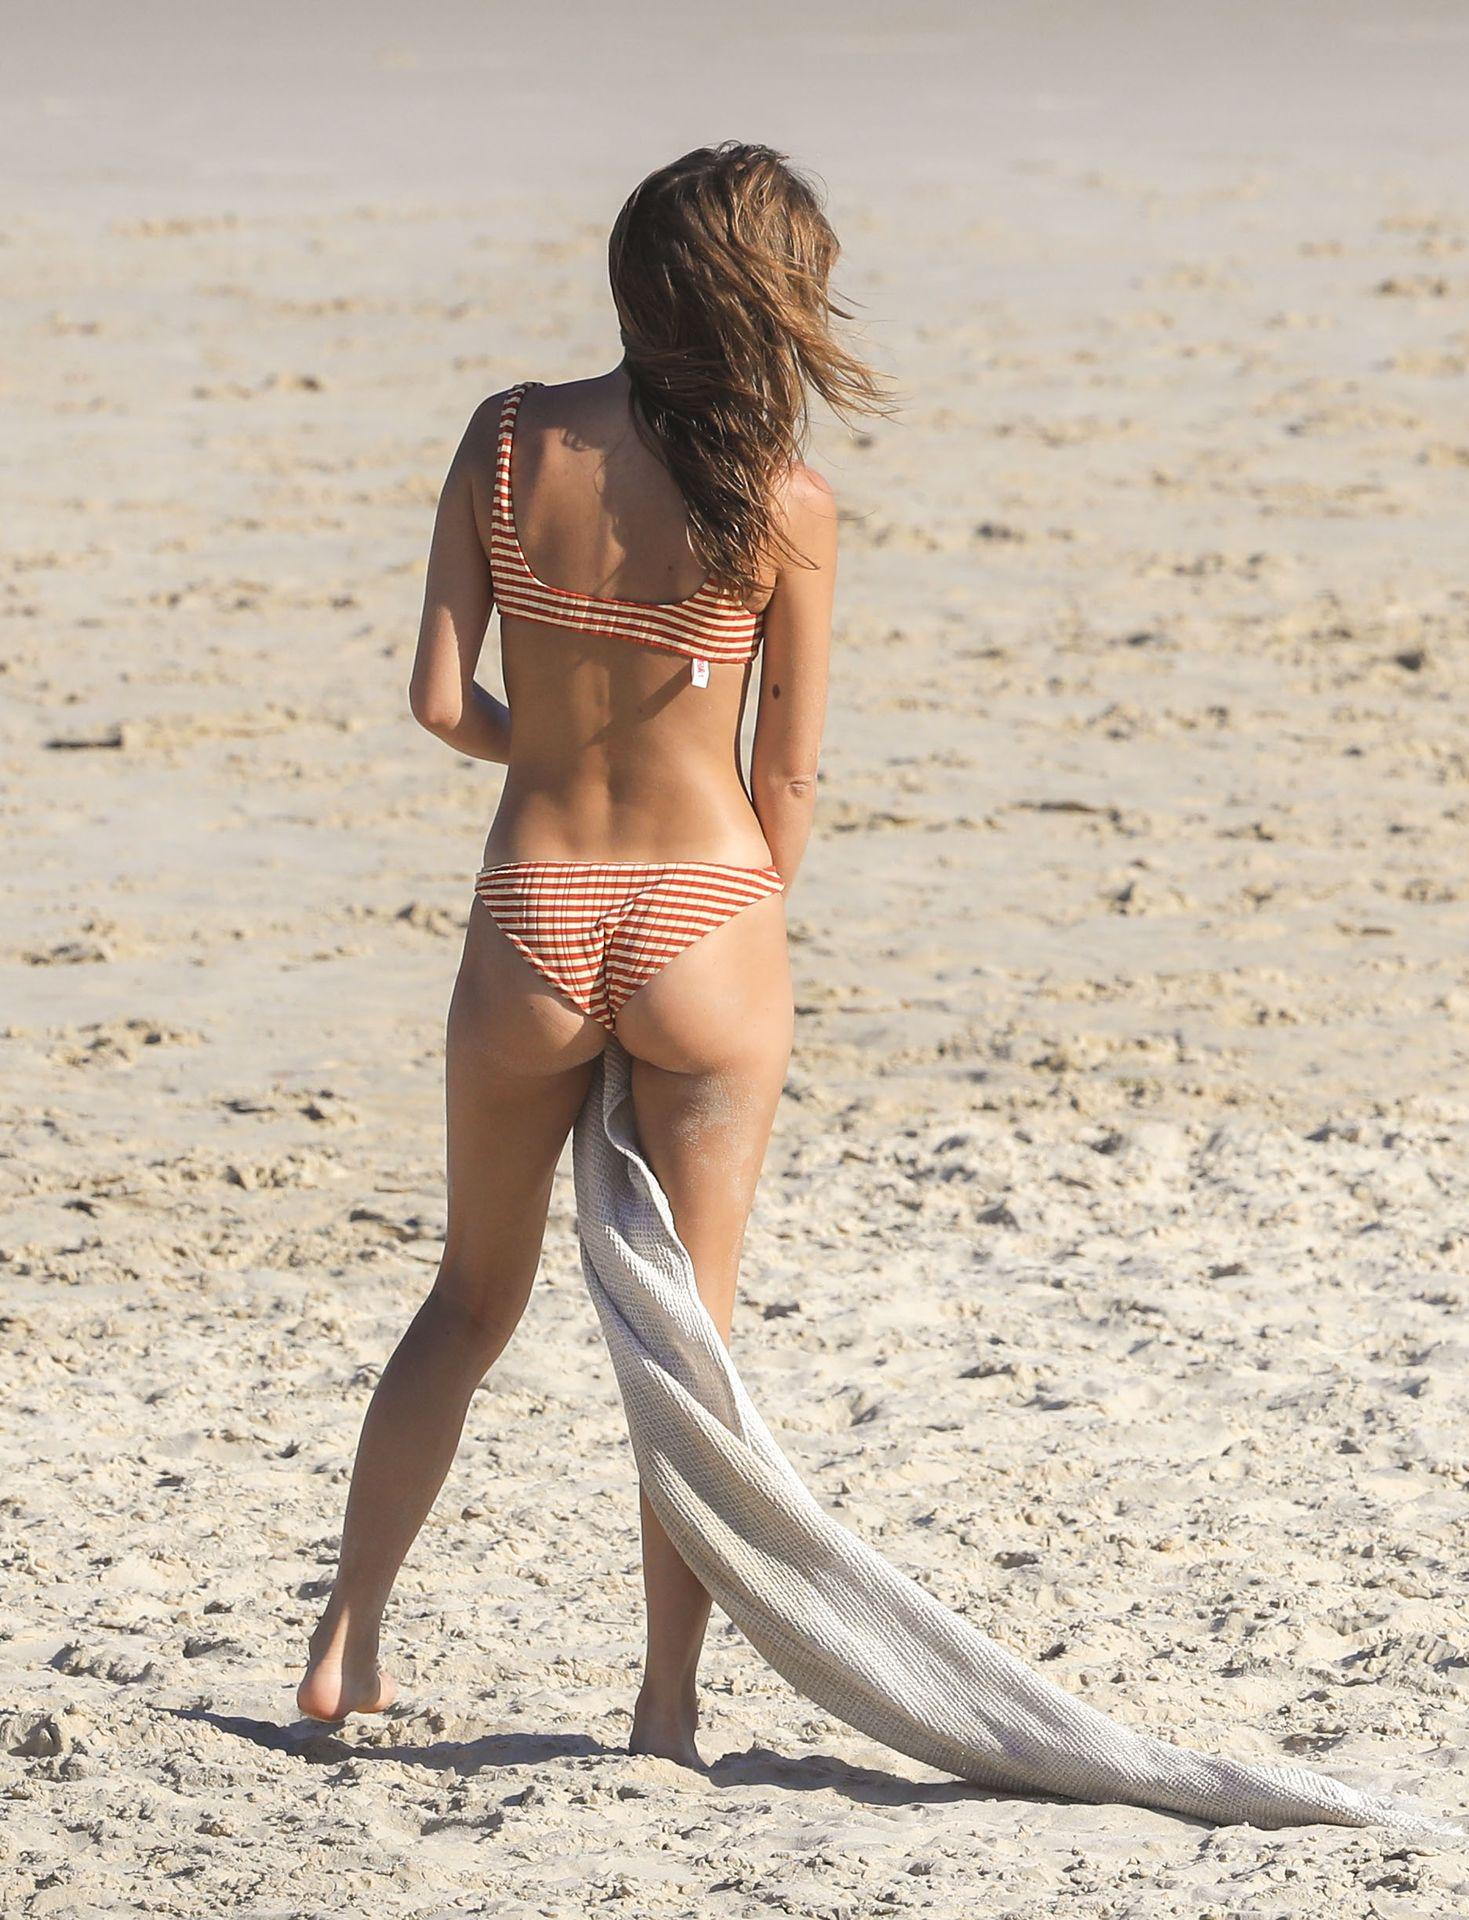 Gabriella Brooks Hot – Liam Hemsworth's New Girlfriend 0052